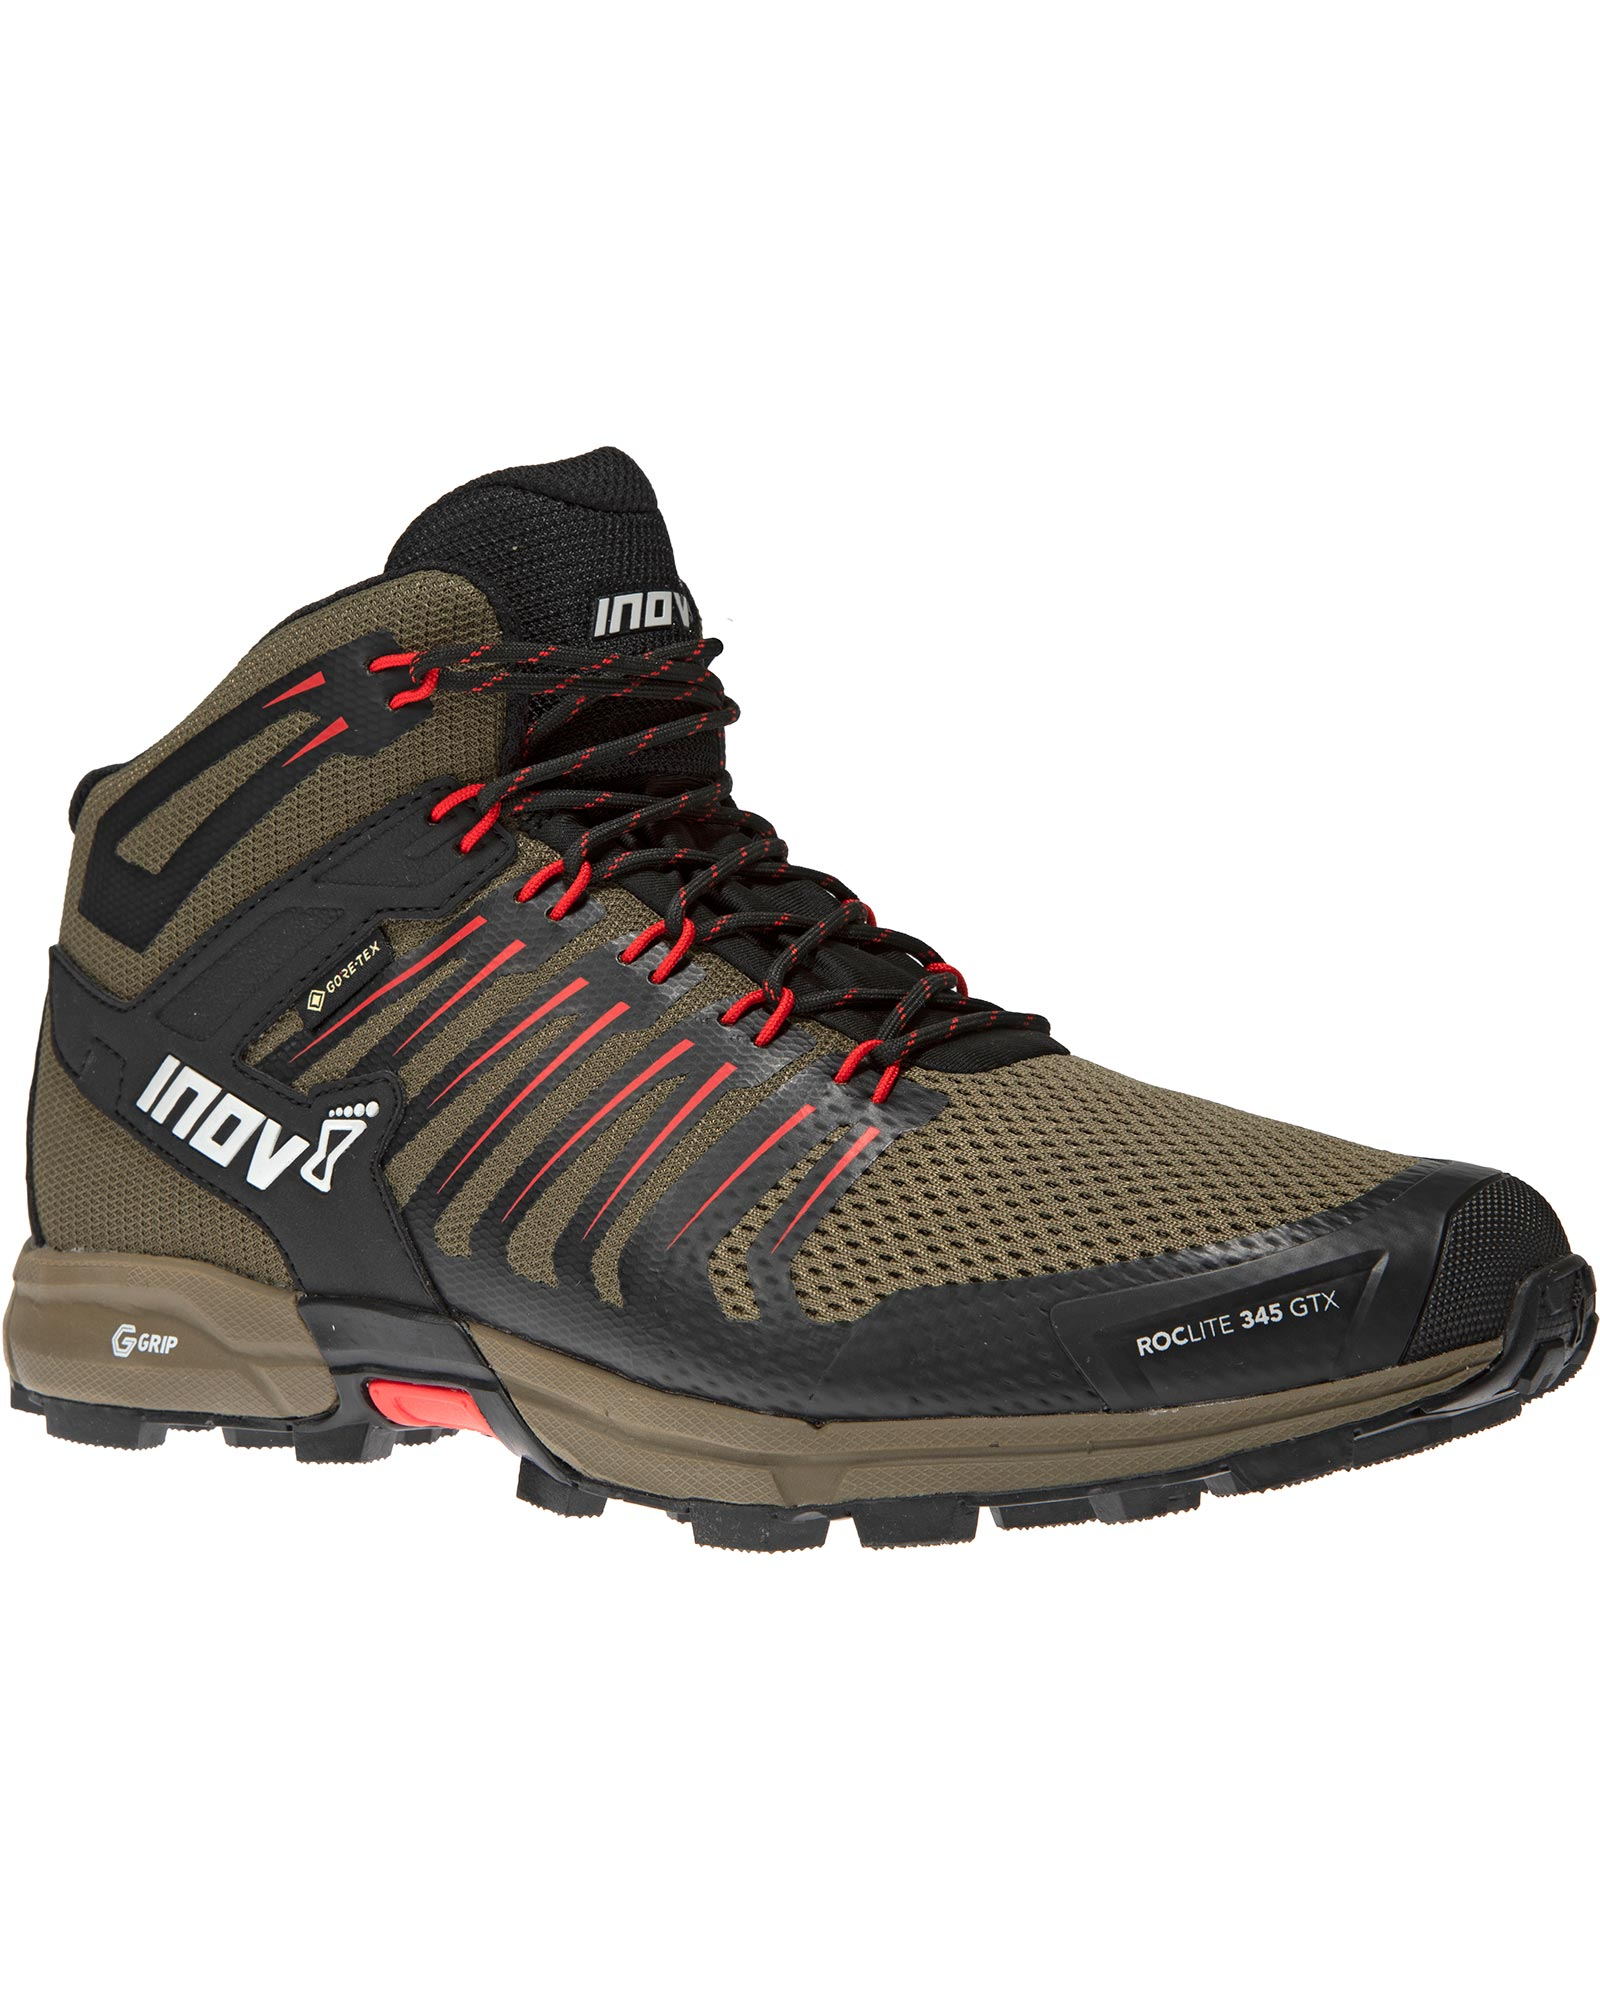 Inov-8 Men's Roclite G 345 Mid GORE-TEX Walking Boots 0